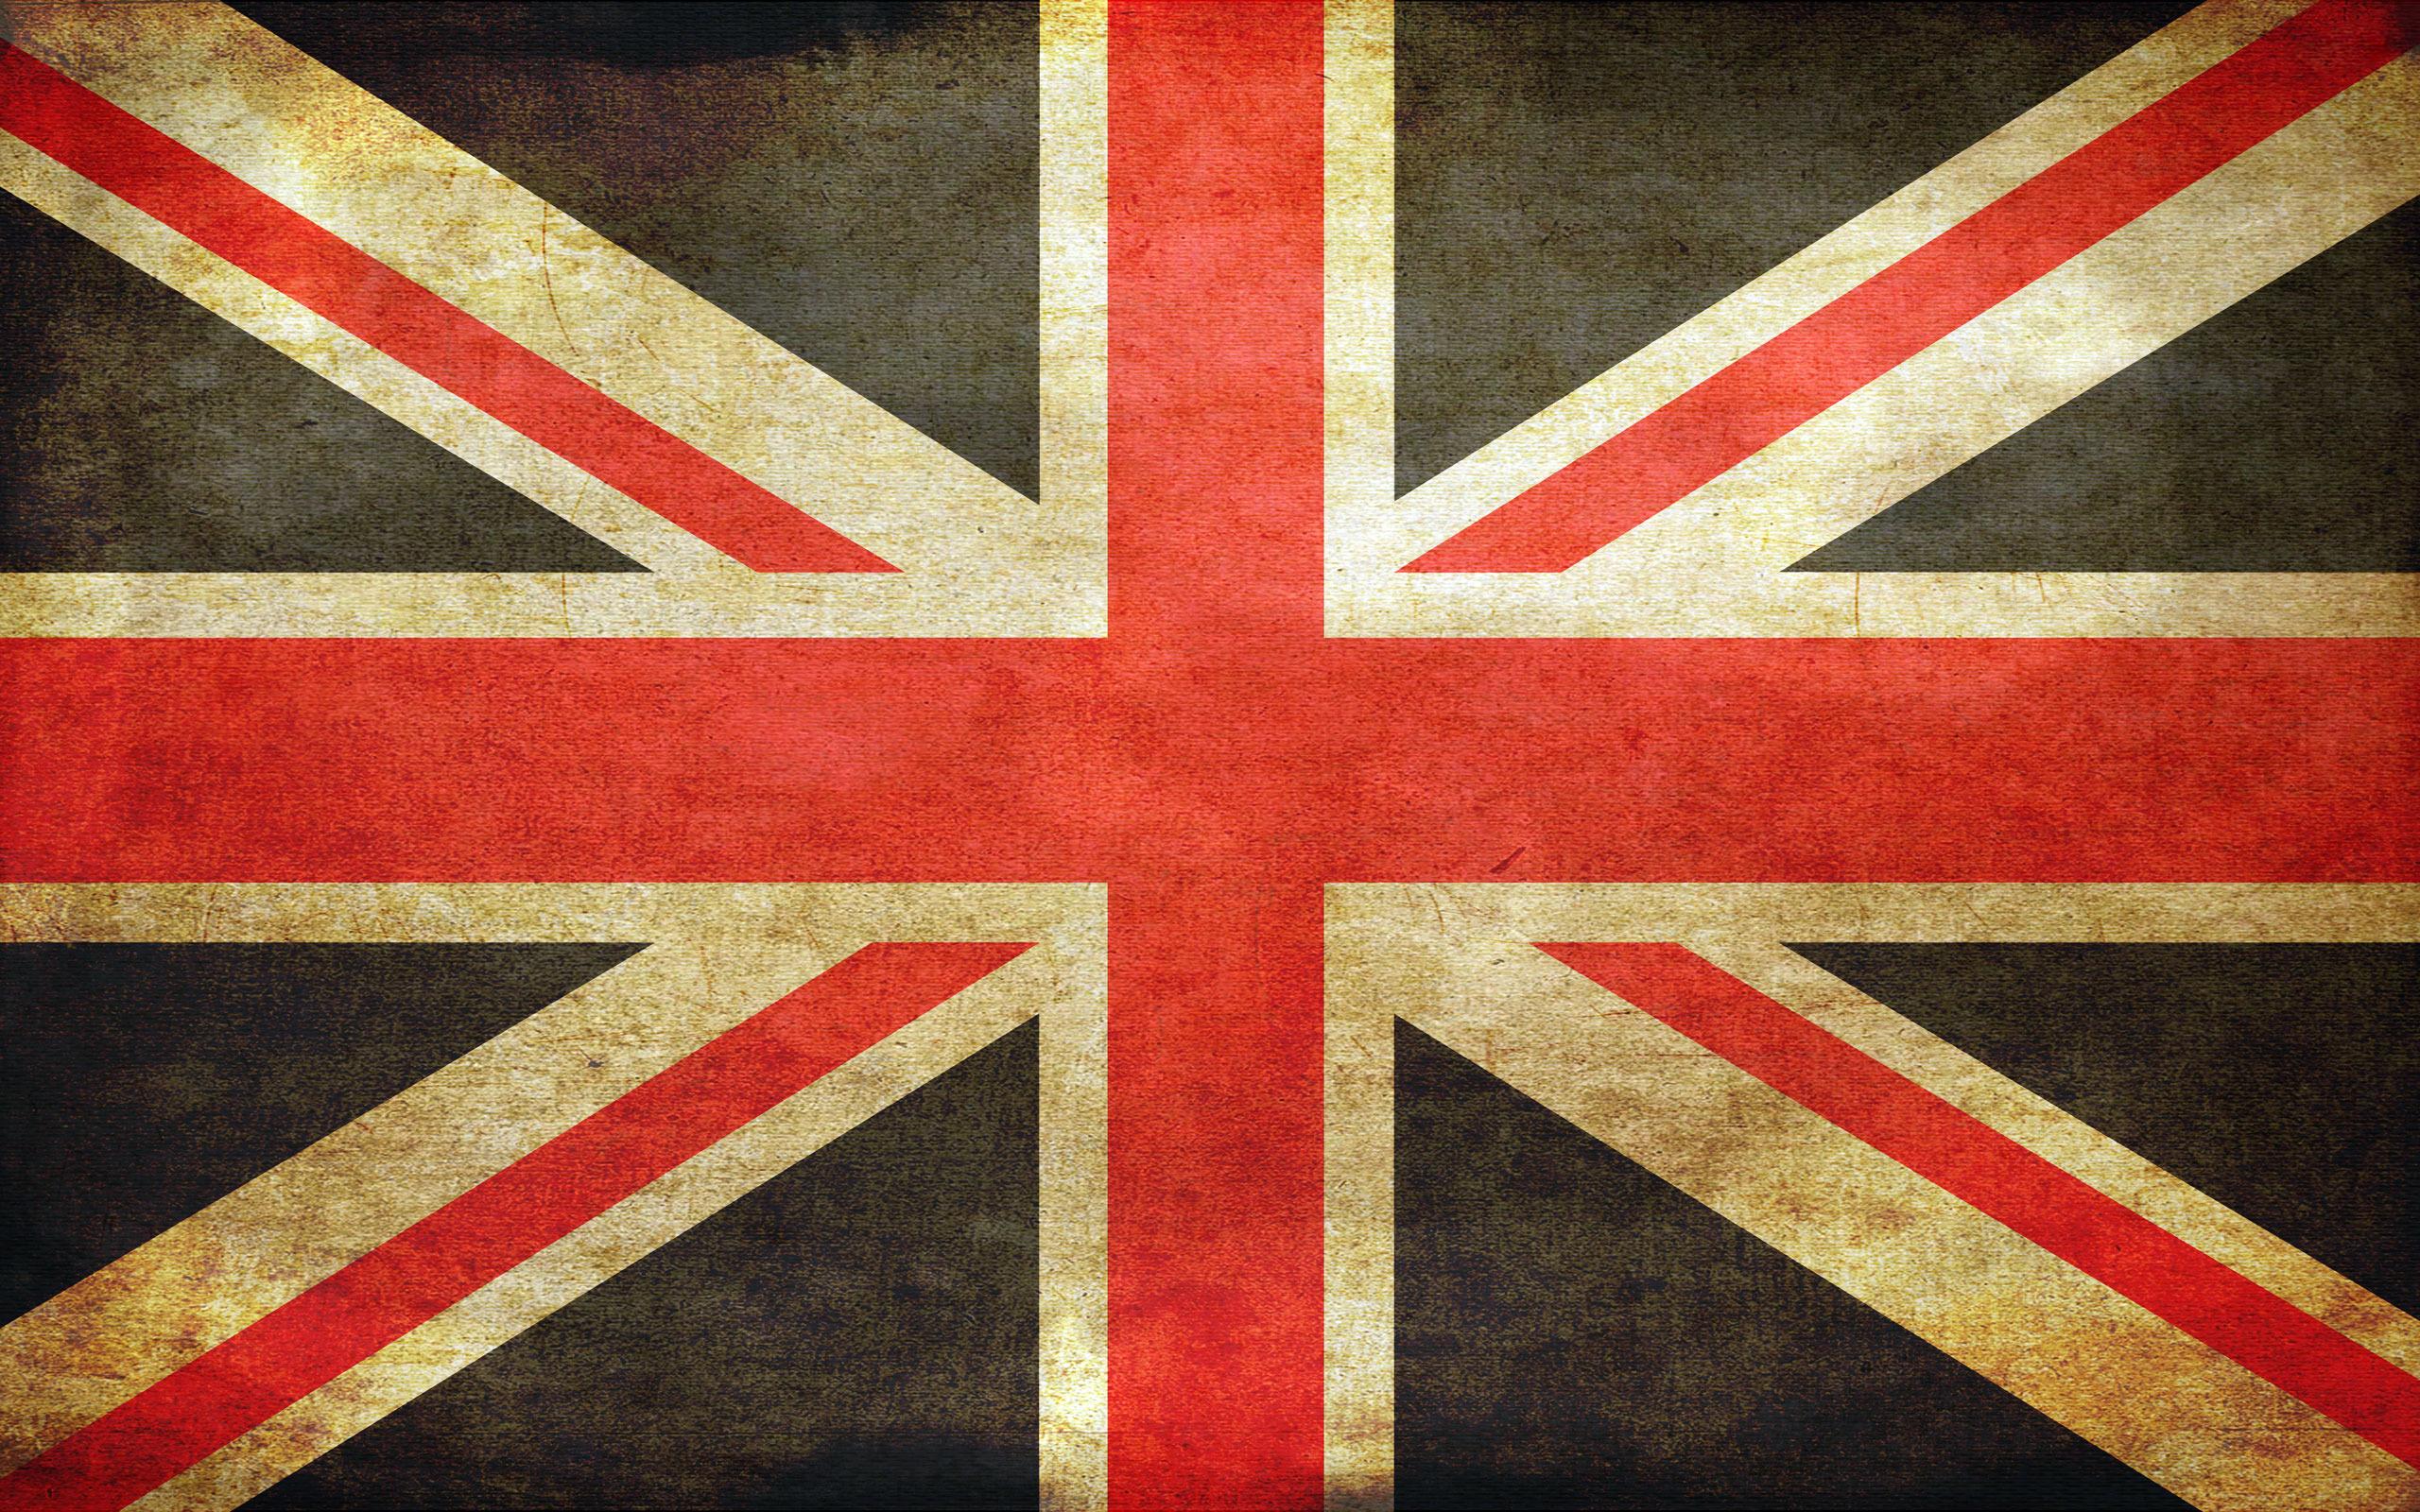 Union Jack Iphone Wallpaper Flag Of United Kingdom Fond D 233 Cran Hd Arri 232 Re Plan